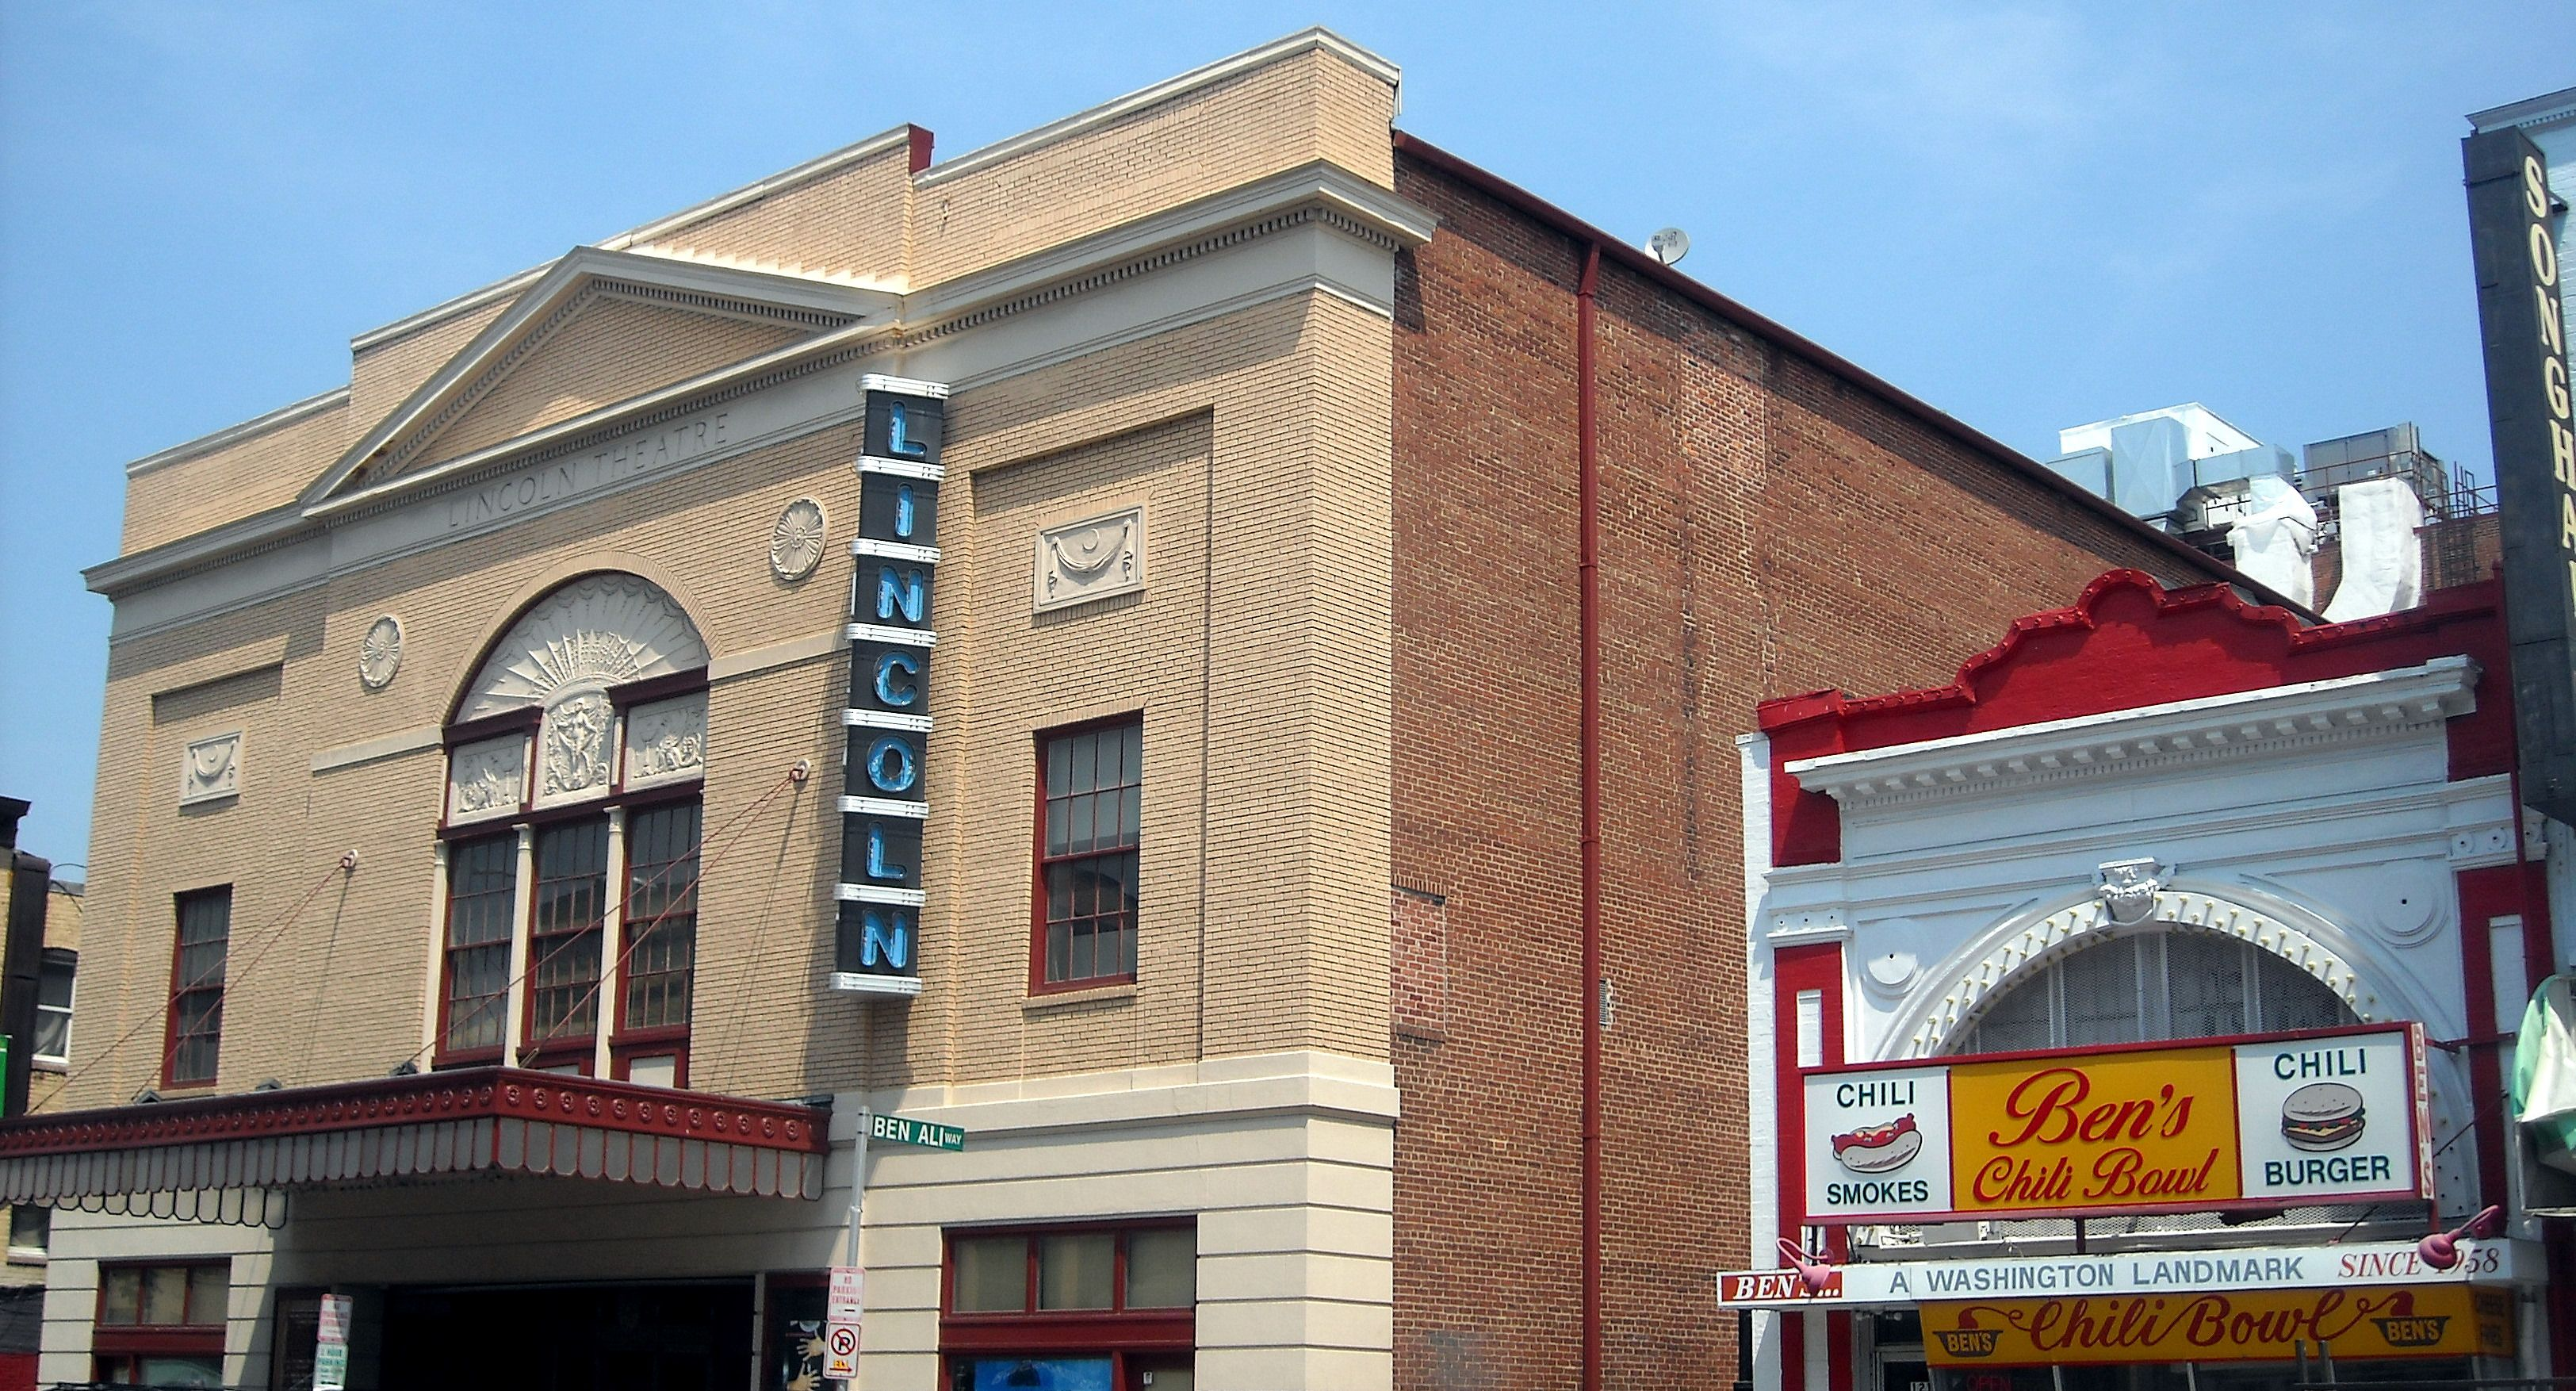 Top 7 U Street Nightclubs and Bars: Washington, DC